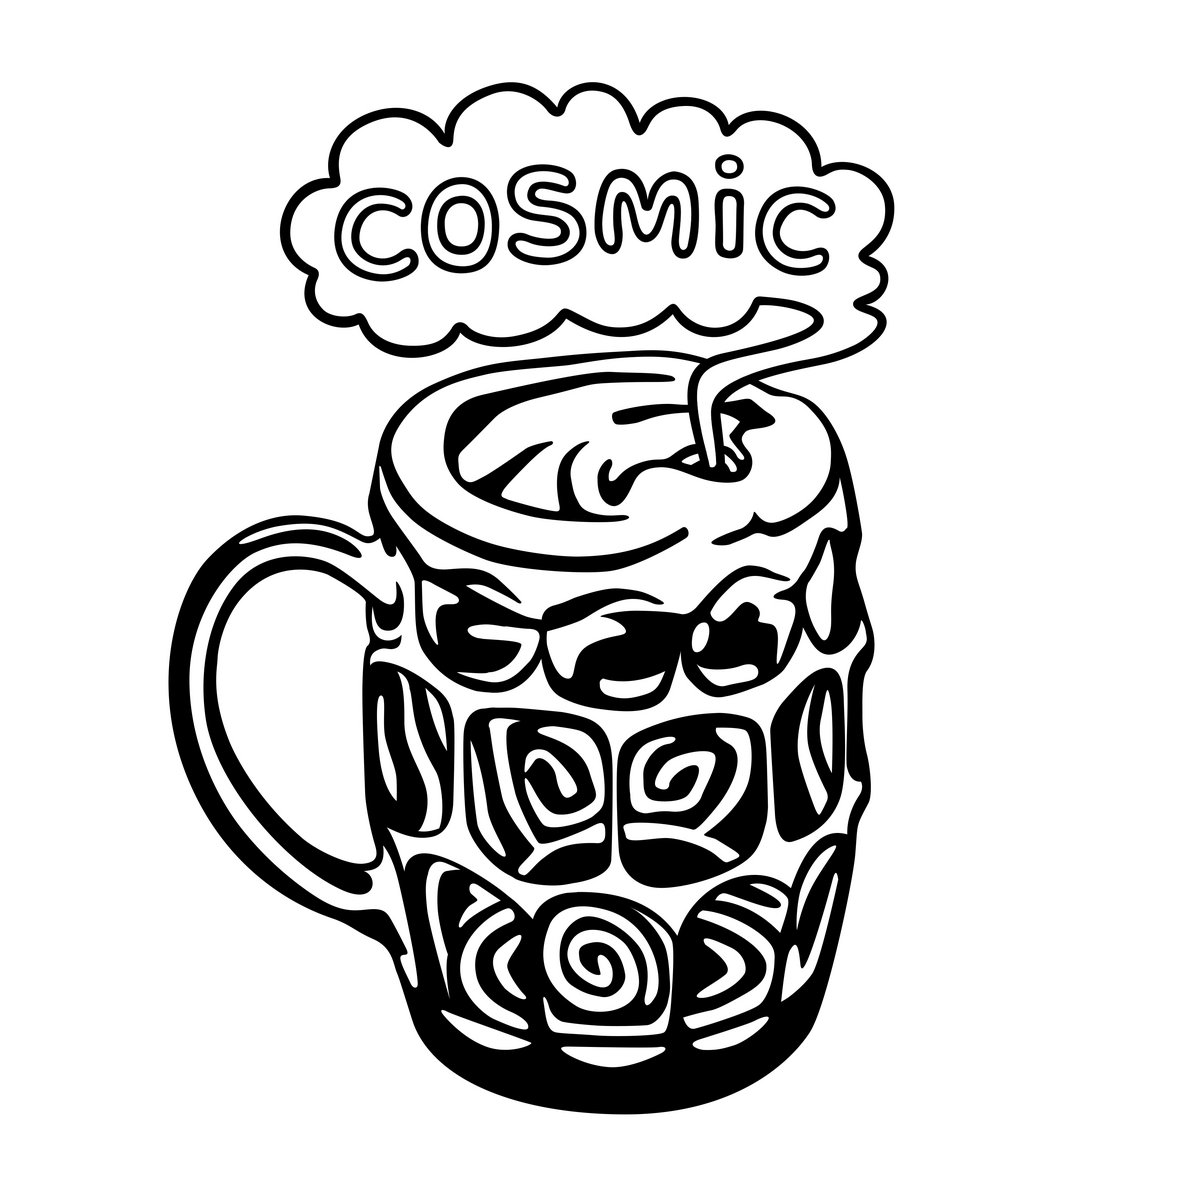 Cosmic Pint Glass